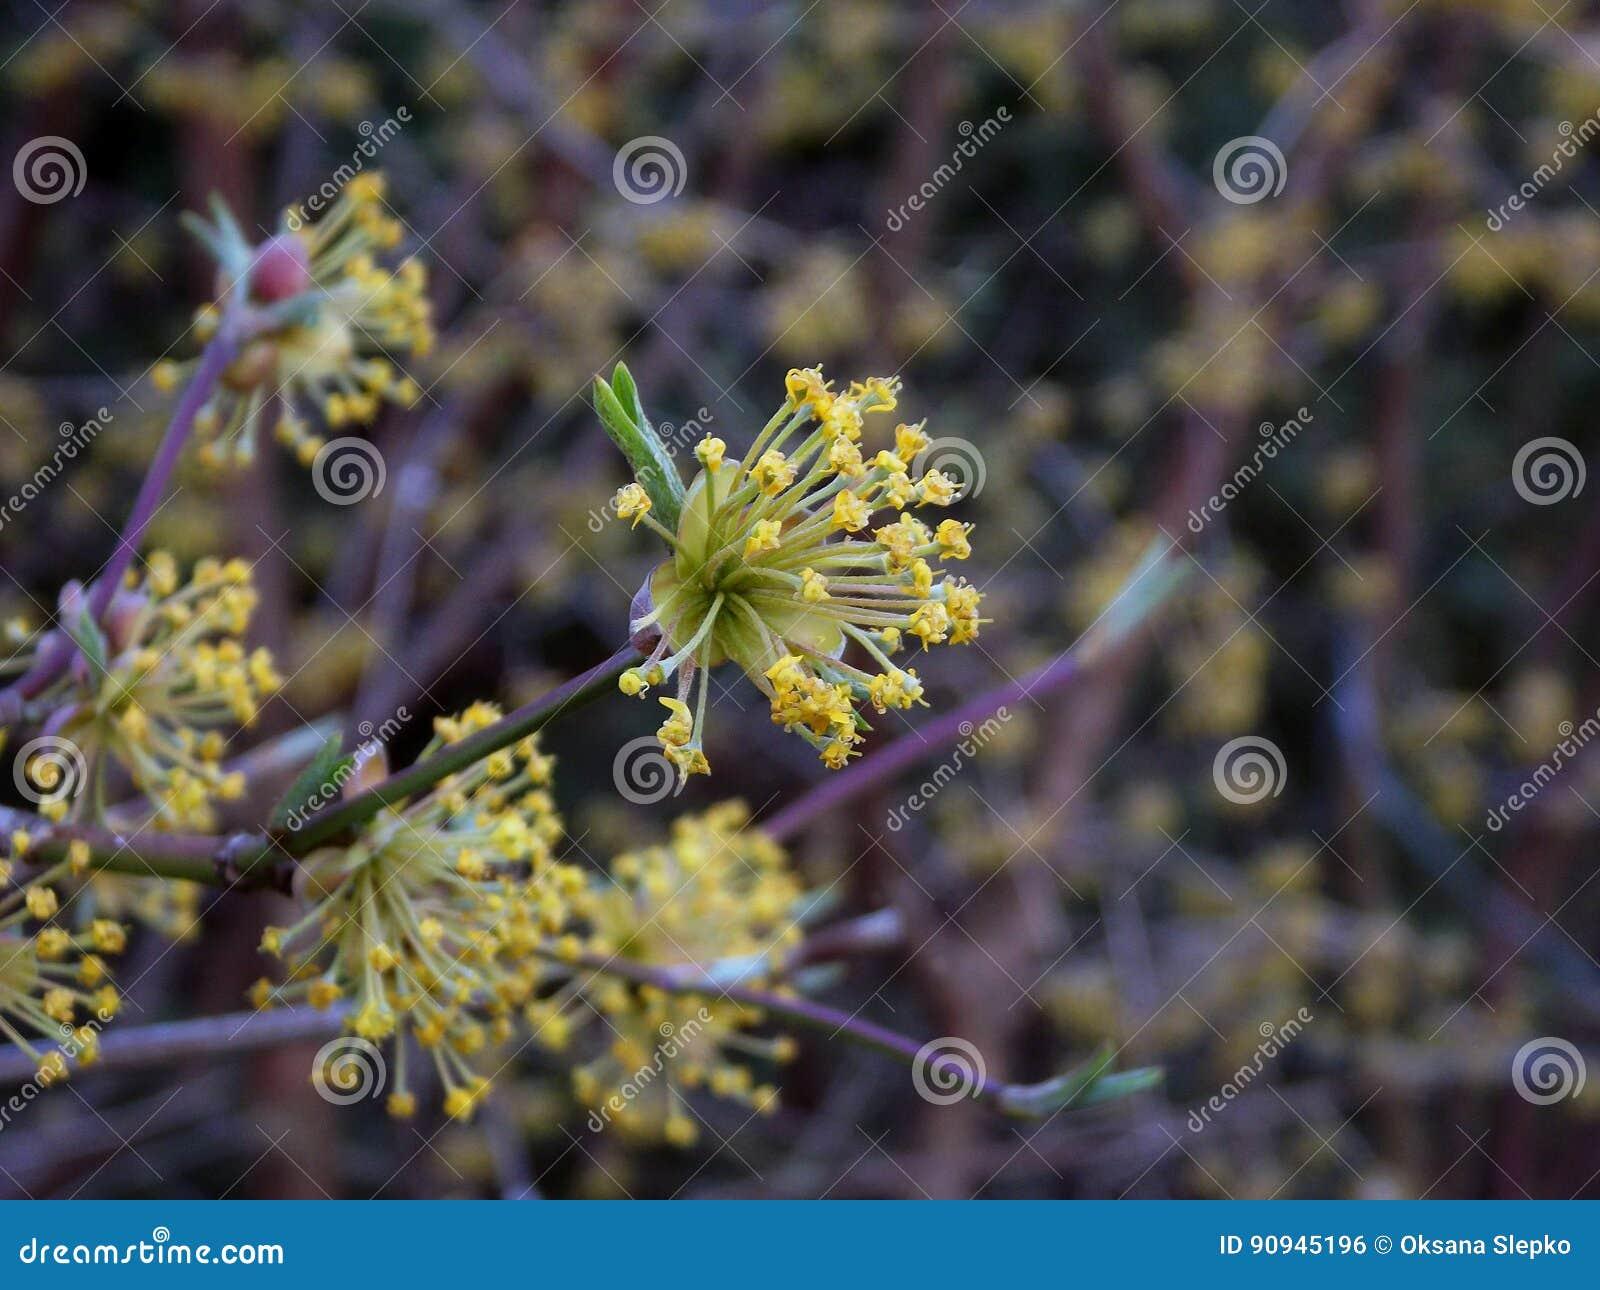 Yellow blossoms of cornus mas flowers of cornelian cherry bush in yellow blossoms of cornus mas flowers of cornelian cherry bush in the early spring dogwood cornel flowering mightylinksfo